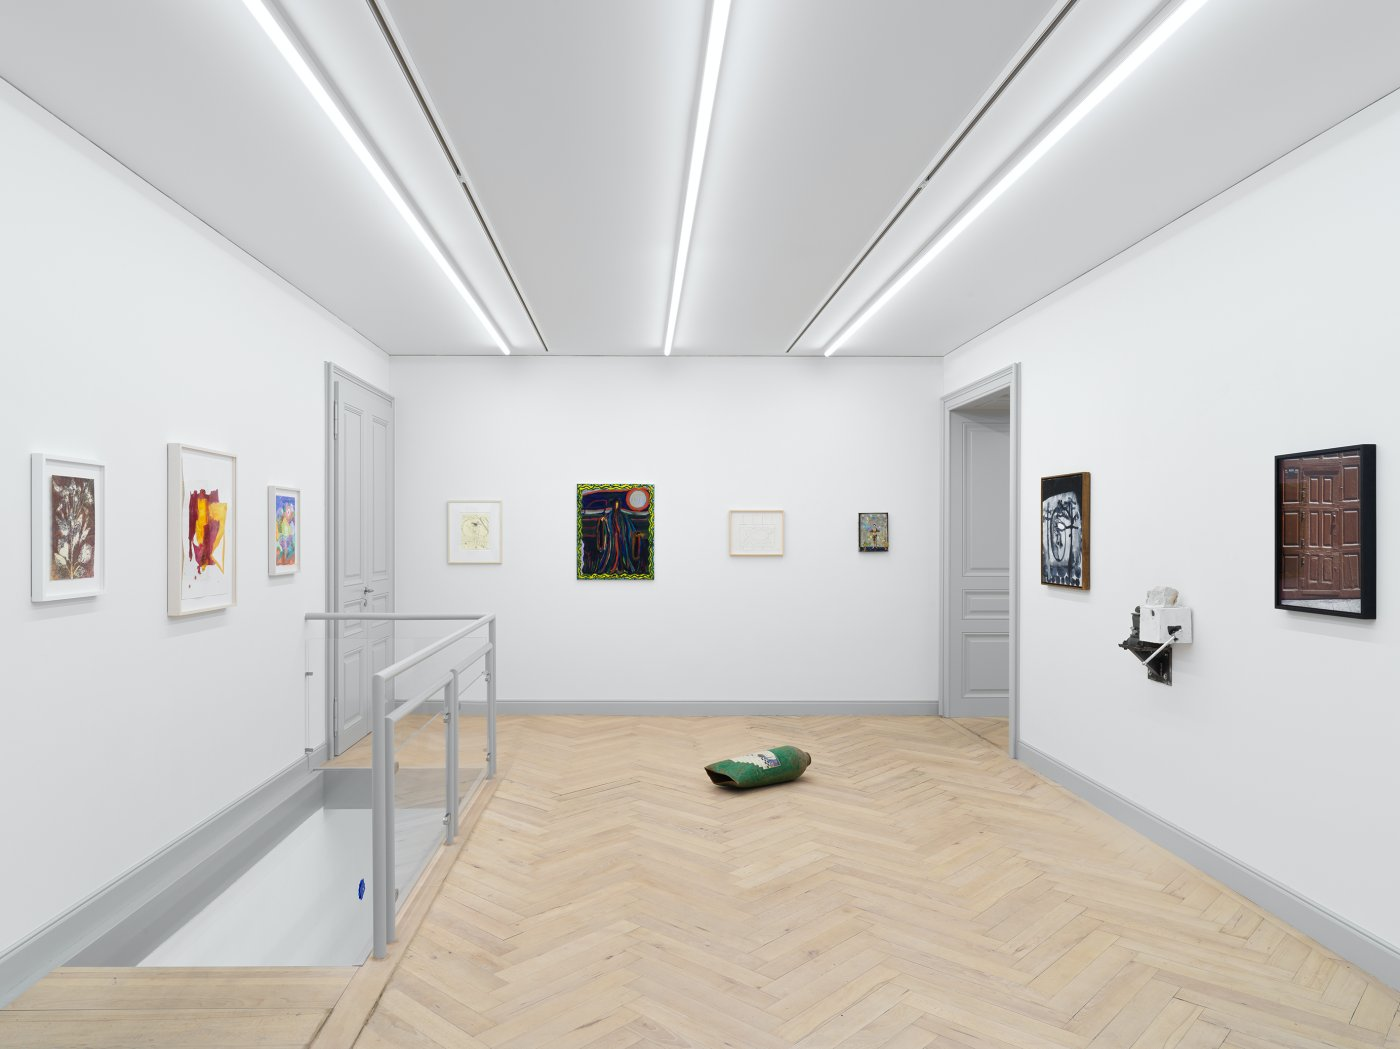 Galerie Eva Presenhuber All in One 8